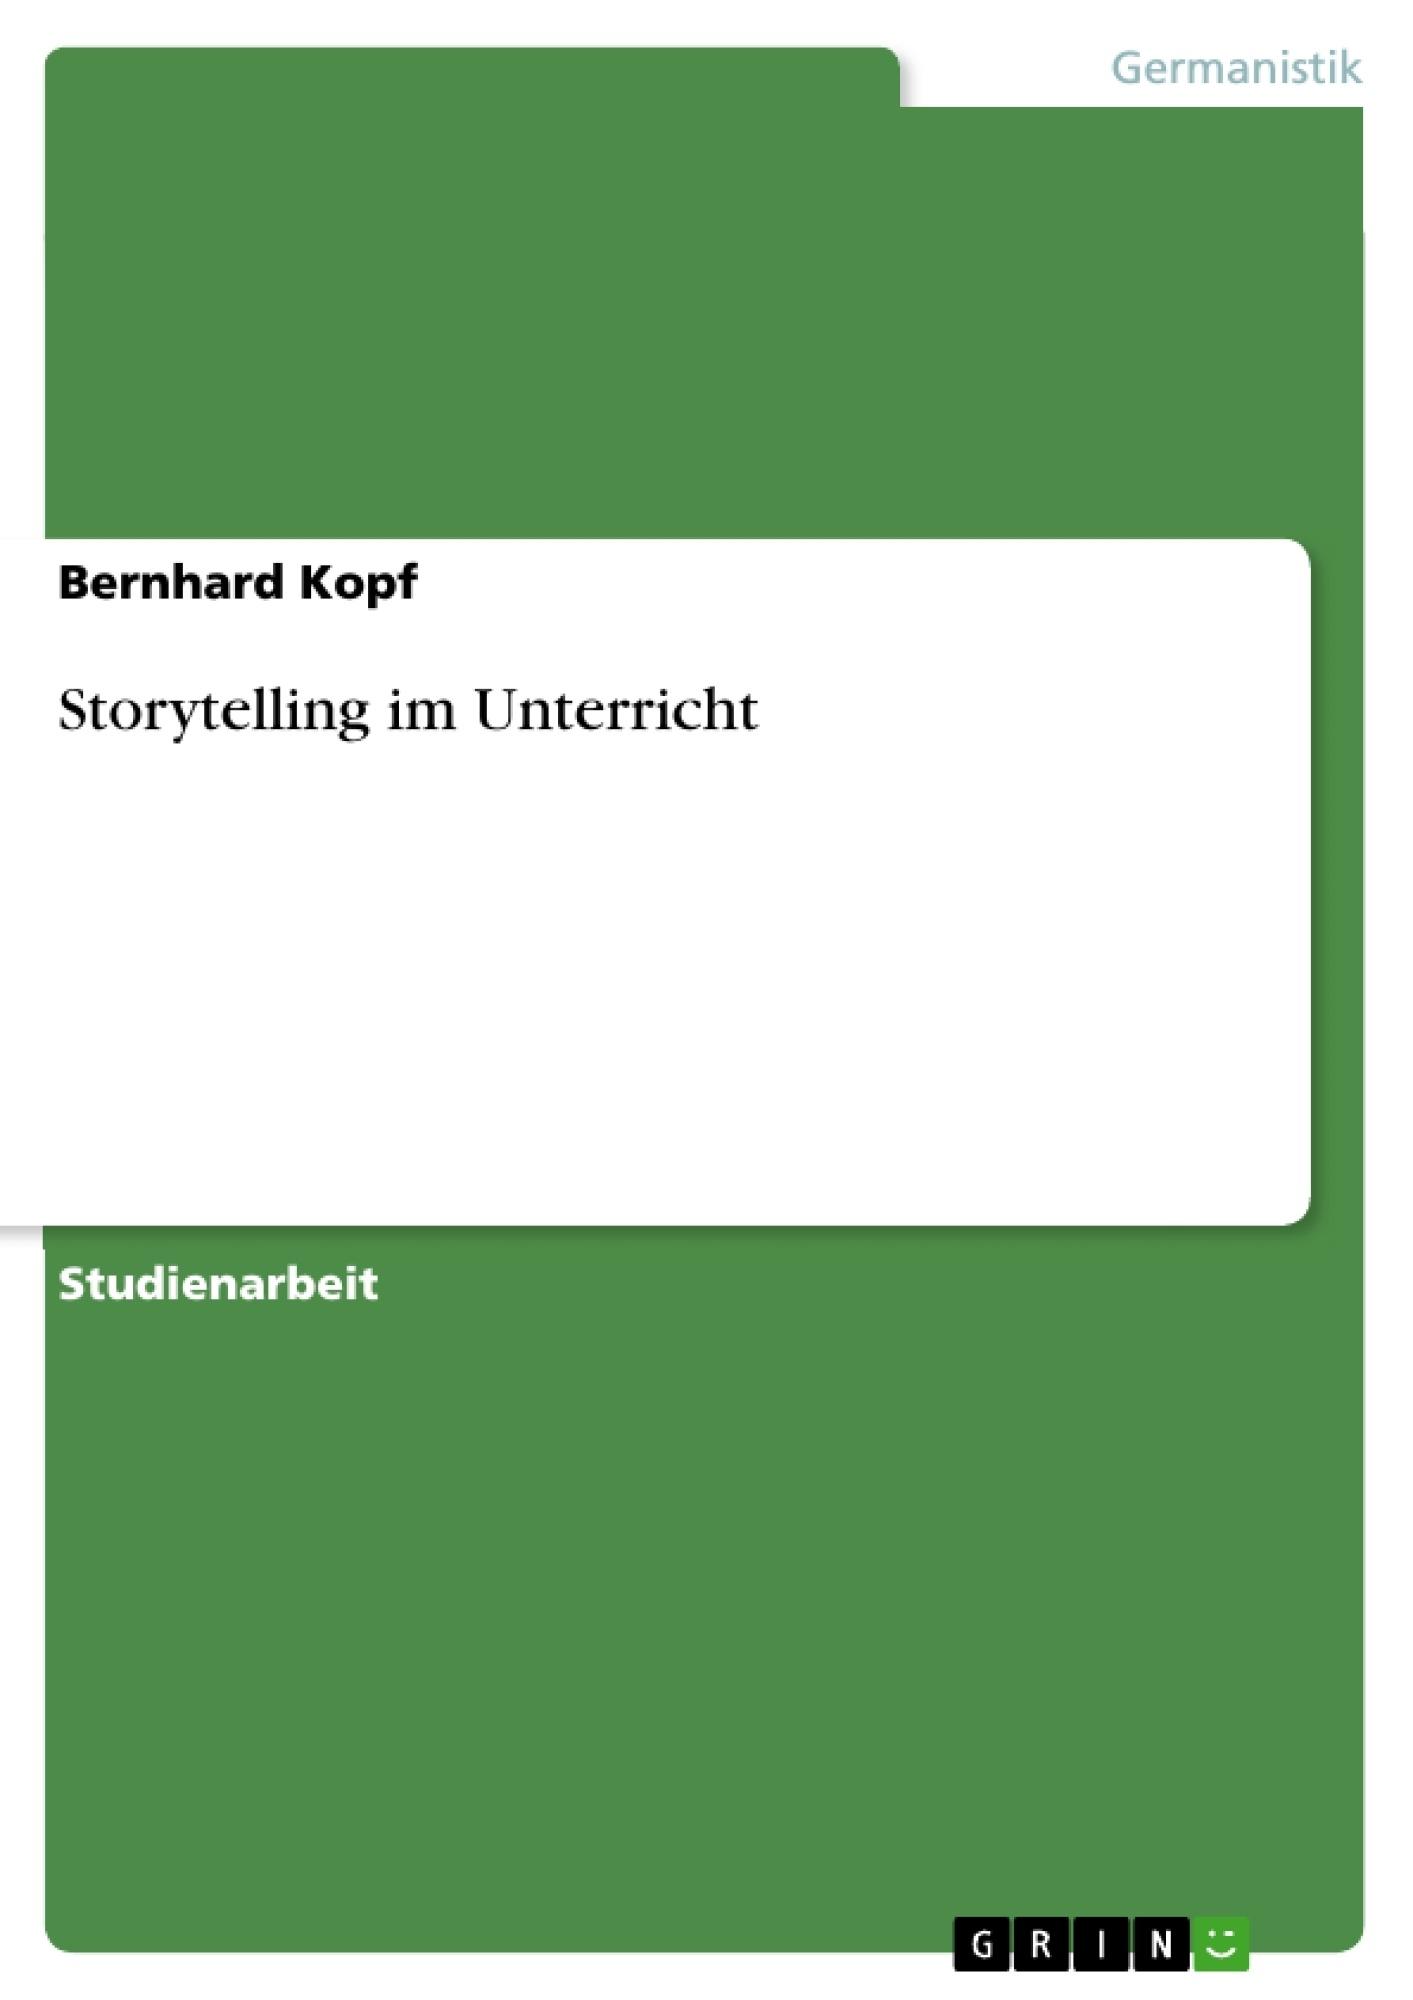 Titel: Storytelling im Unterricht